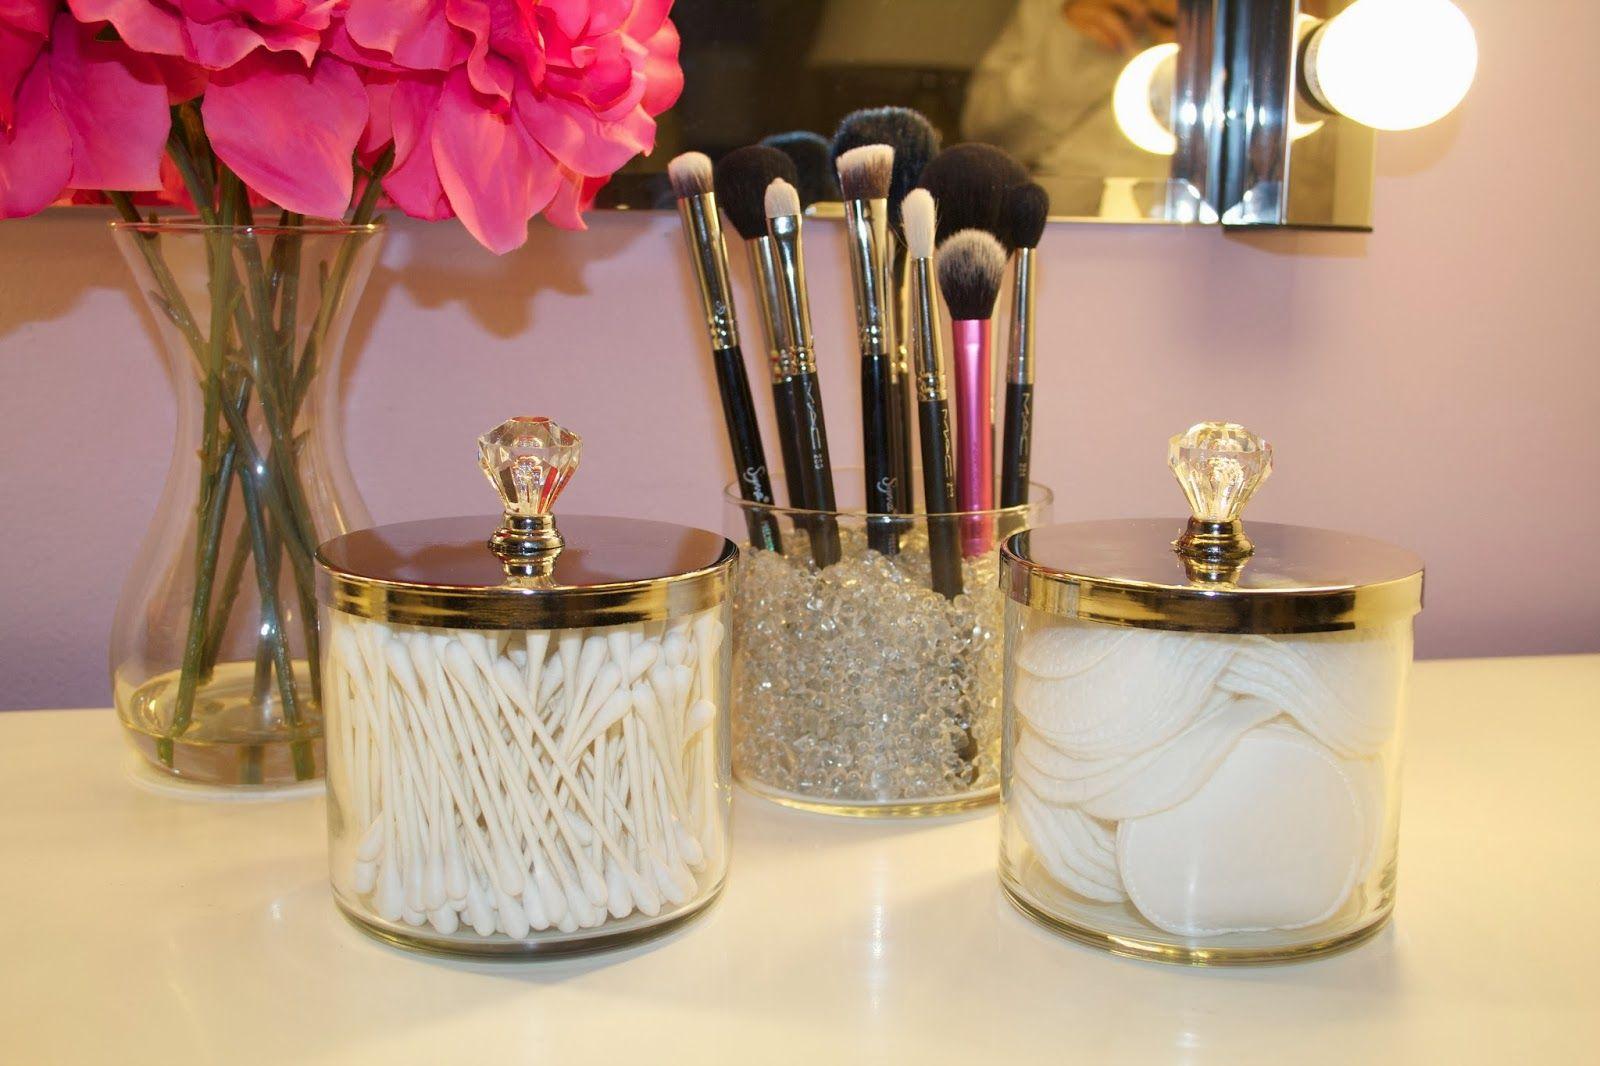 Best 25+ Makeup Vanity Organization Ideas On Pinterest | Vanity Ideas,  Vanity Organization And Makeup Desk